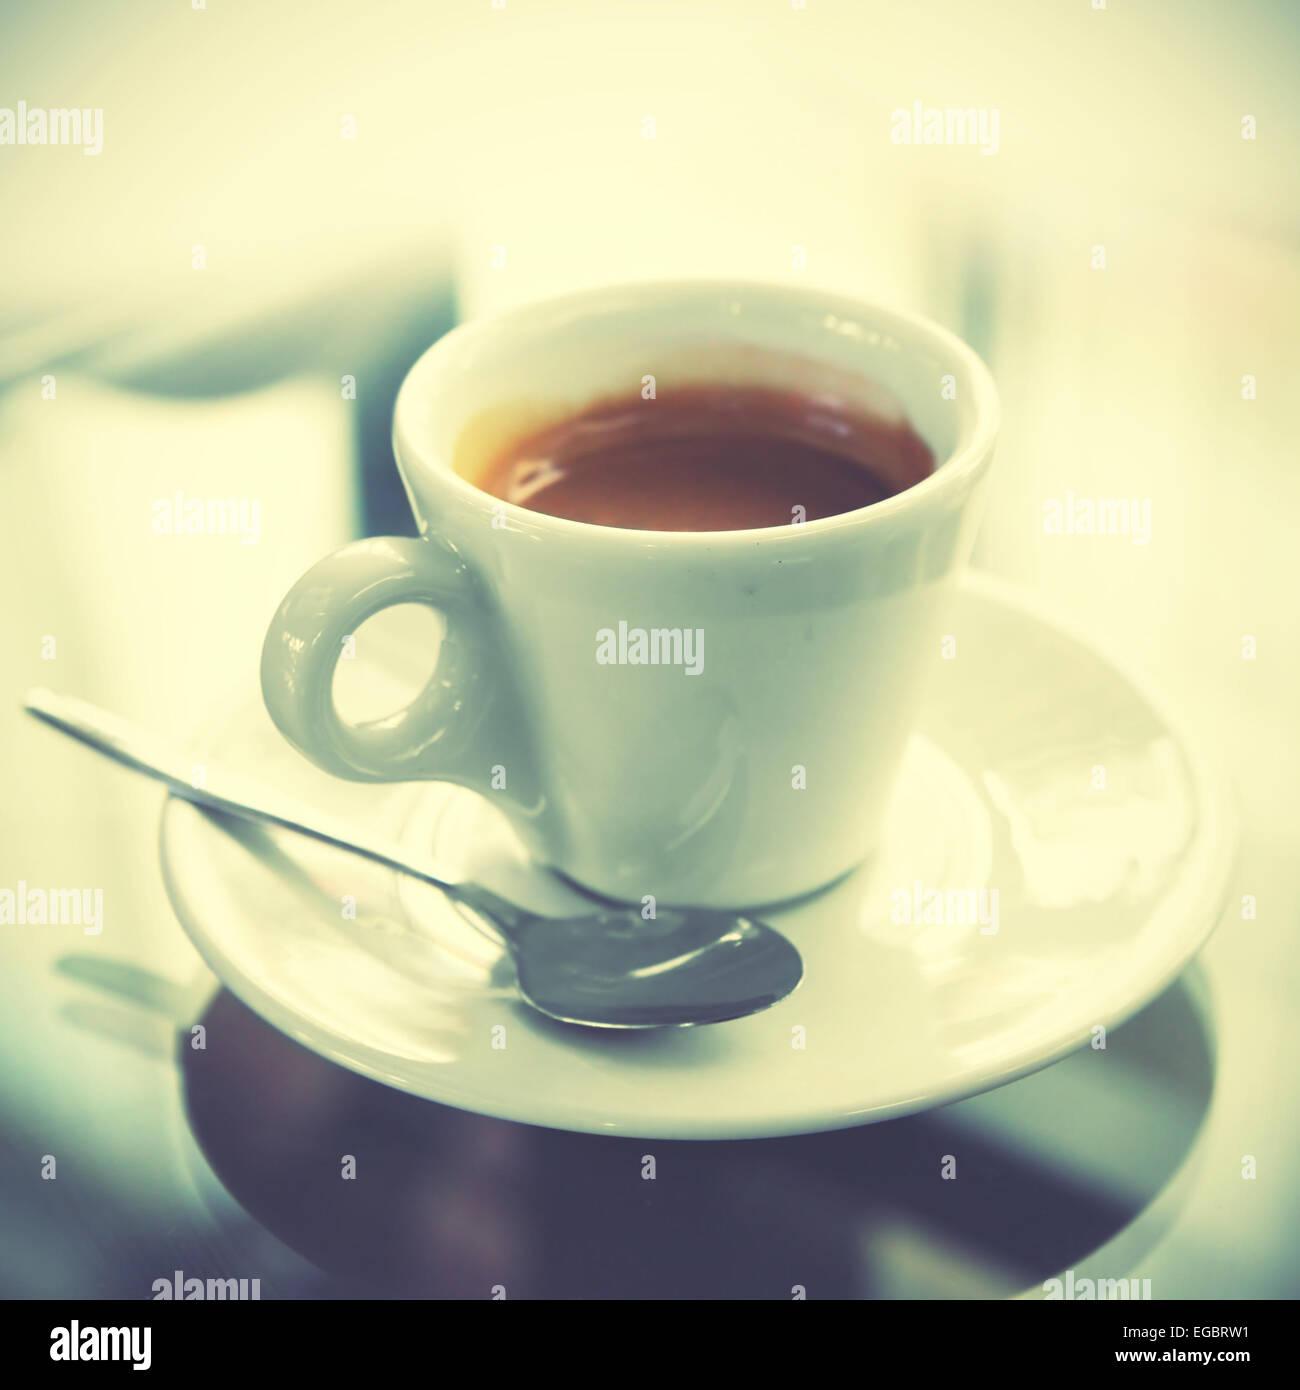 Tasse Espresso. Retro-Stil Bild Stockbild